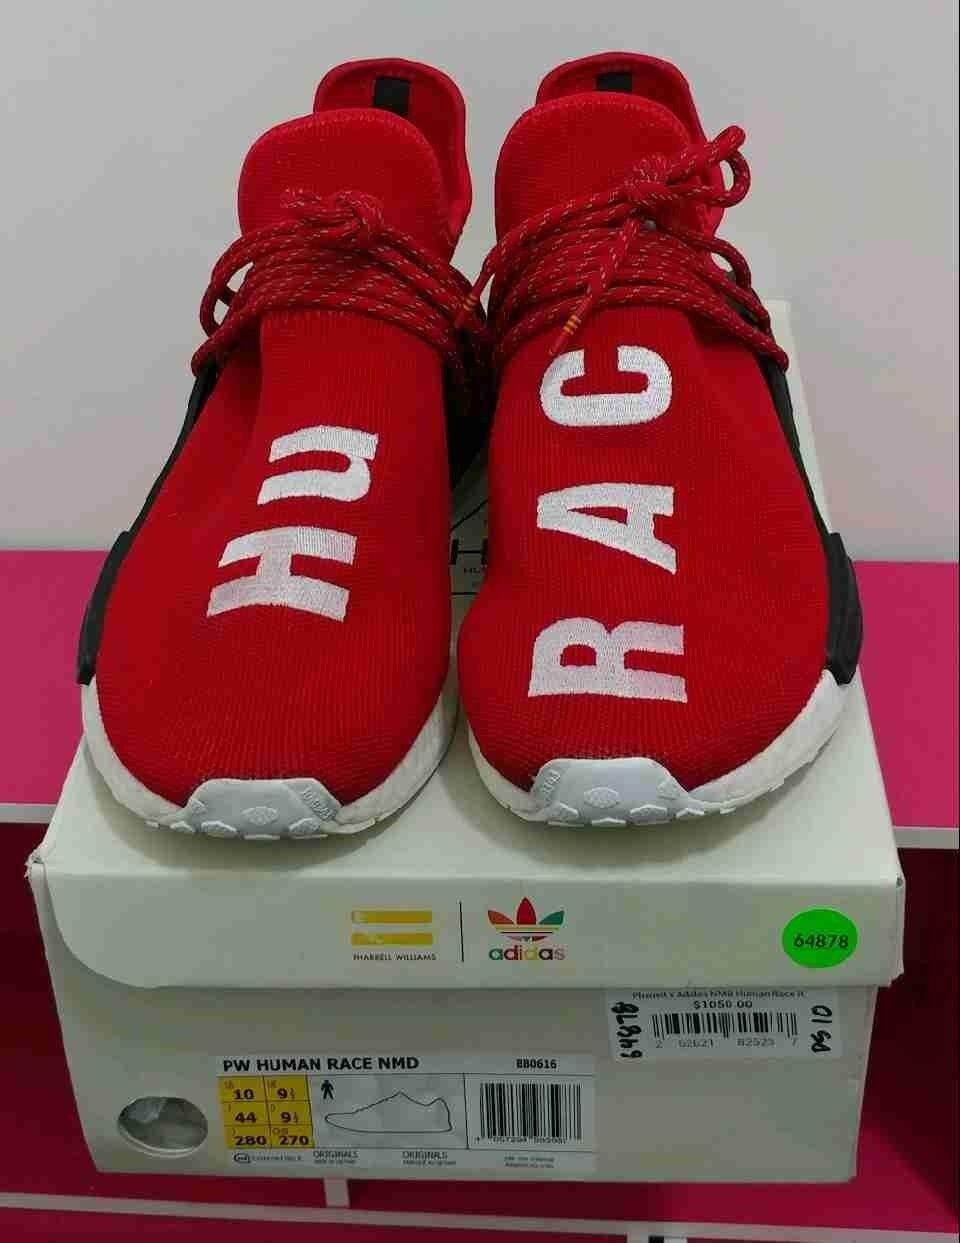 PW Human Race NMD Red size 10. Pharrell Williams Adidas human race